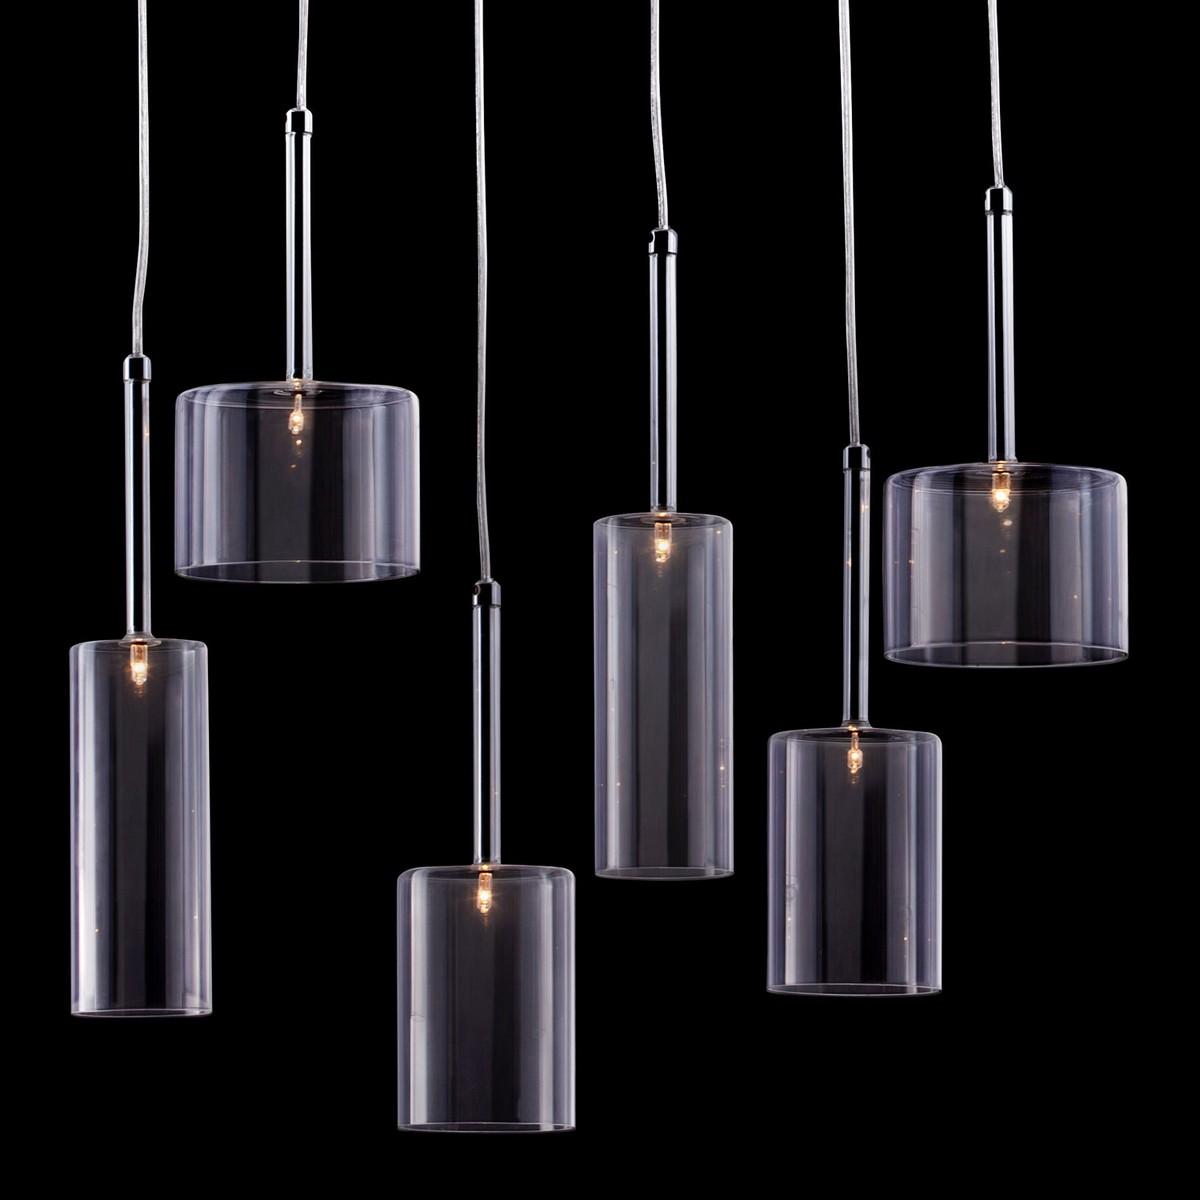 Zuo Modern Hale Ceiling Lamp - Clear